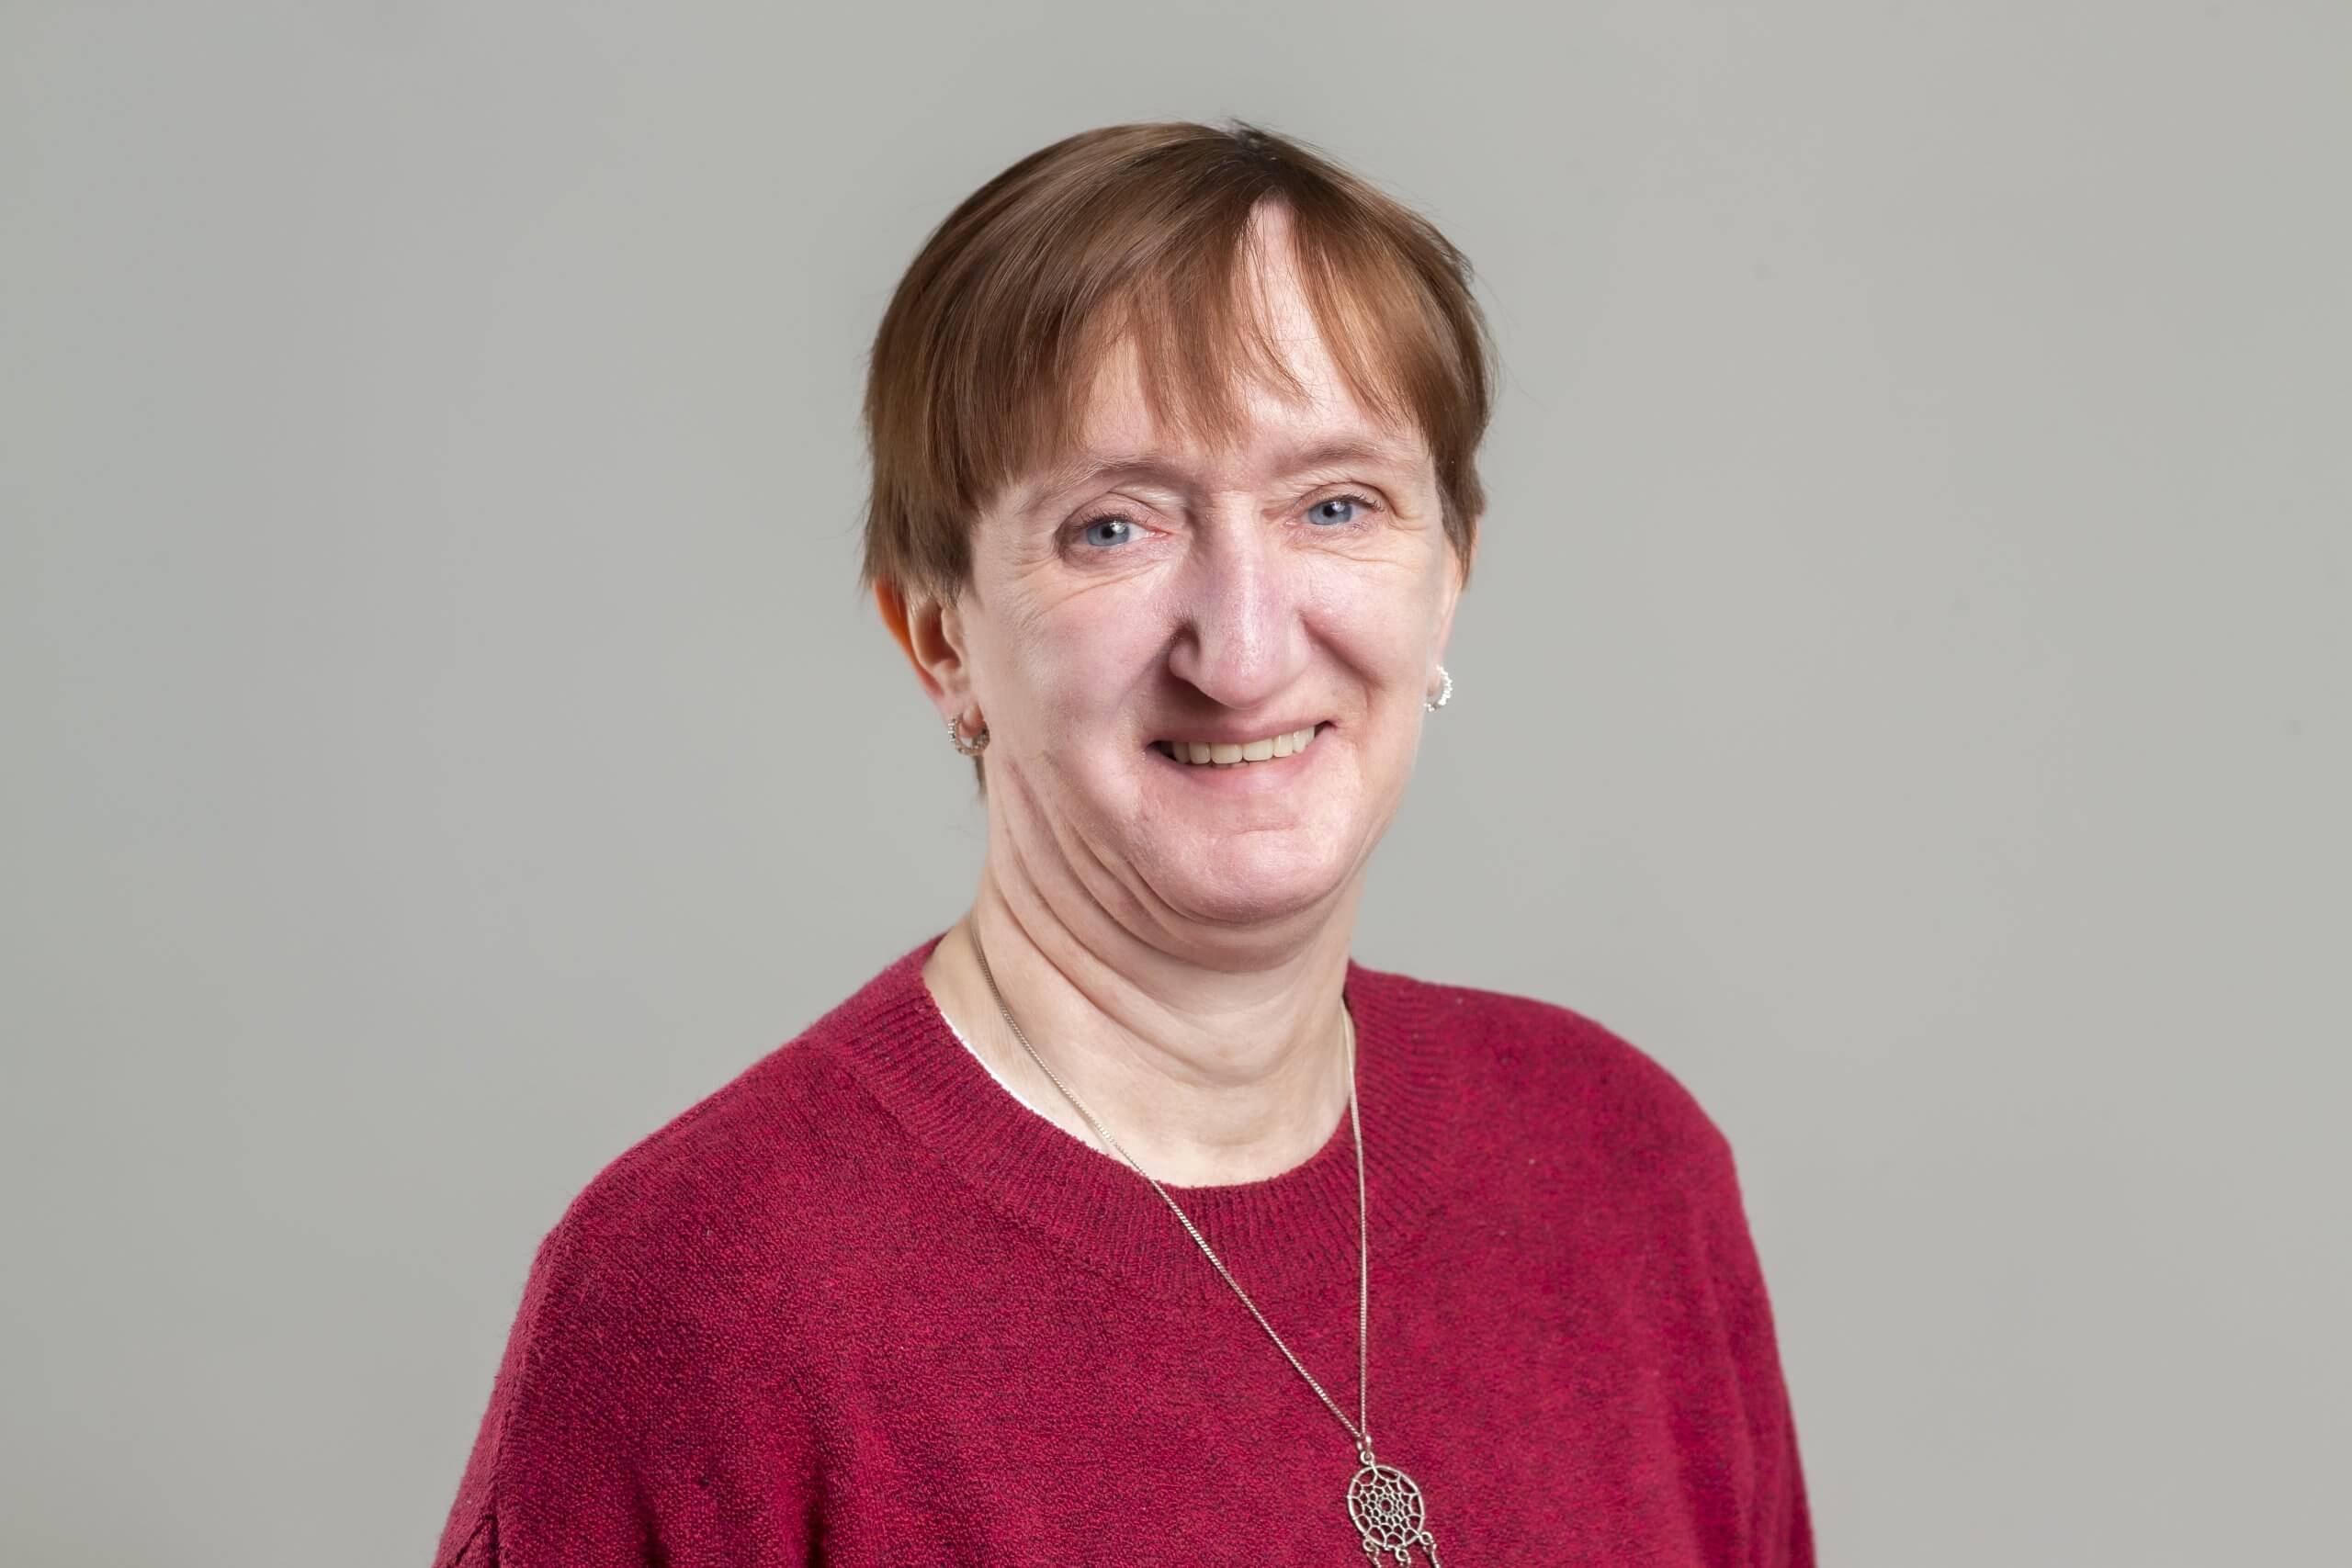 Hedwig Unterberger